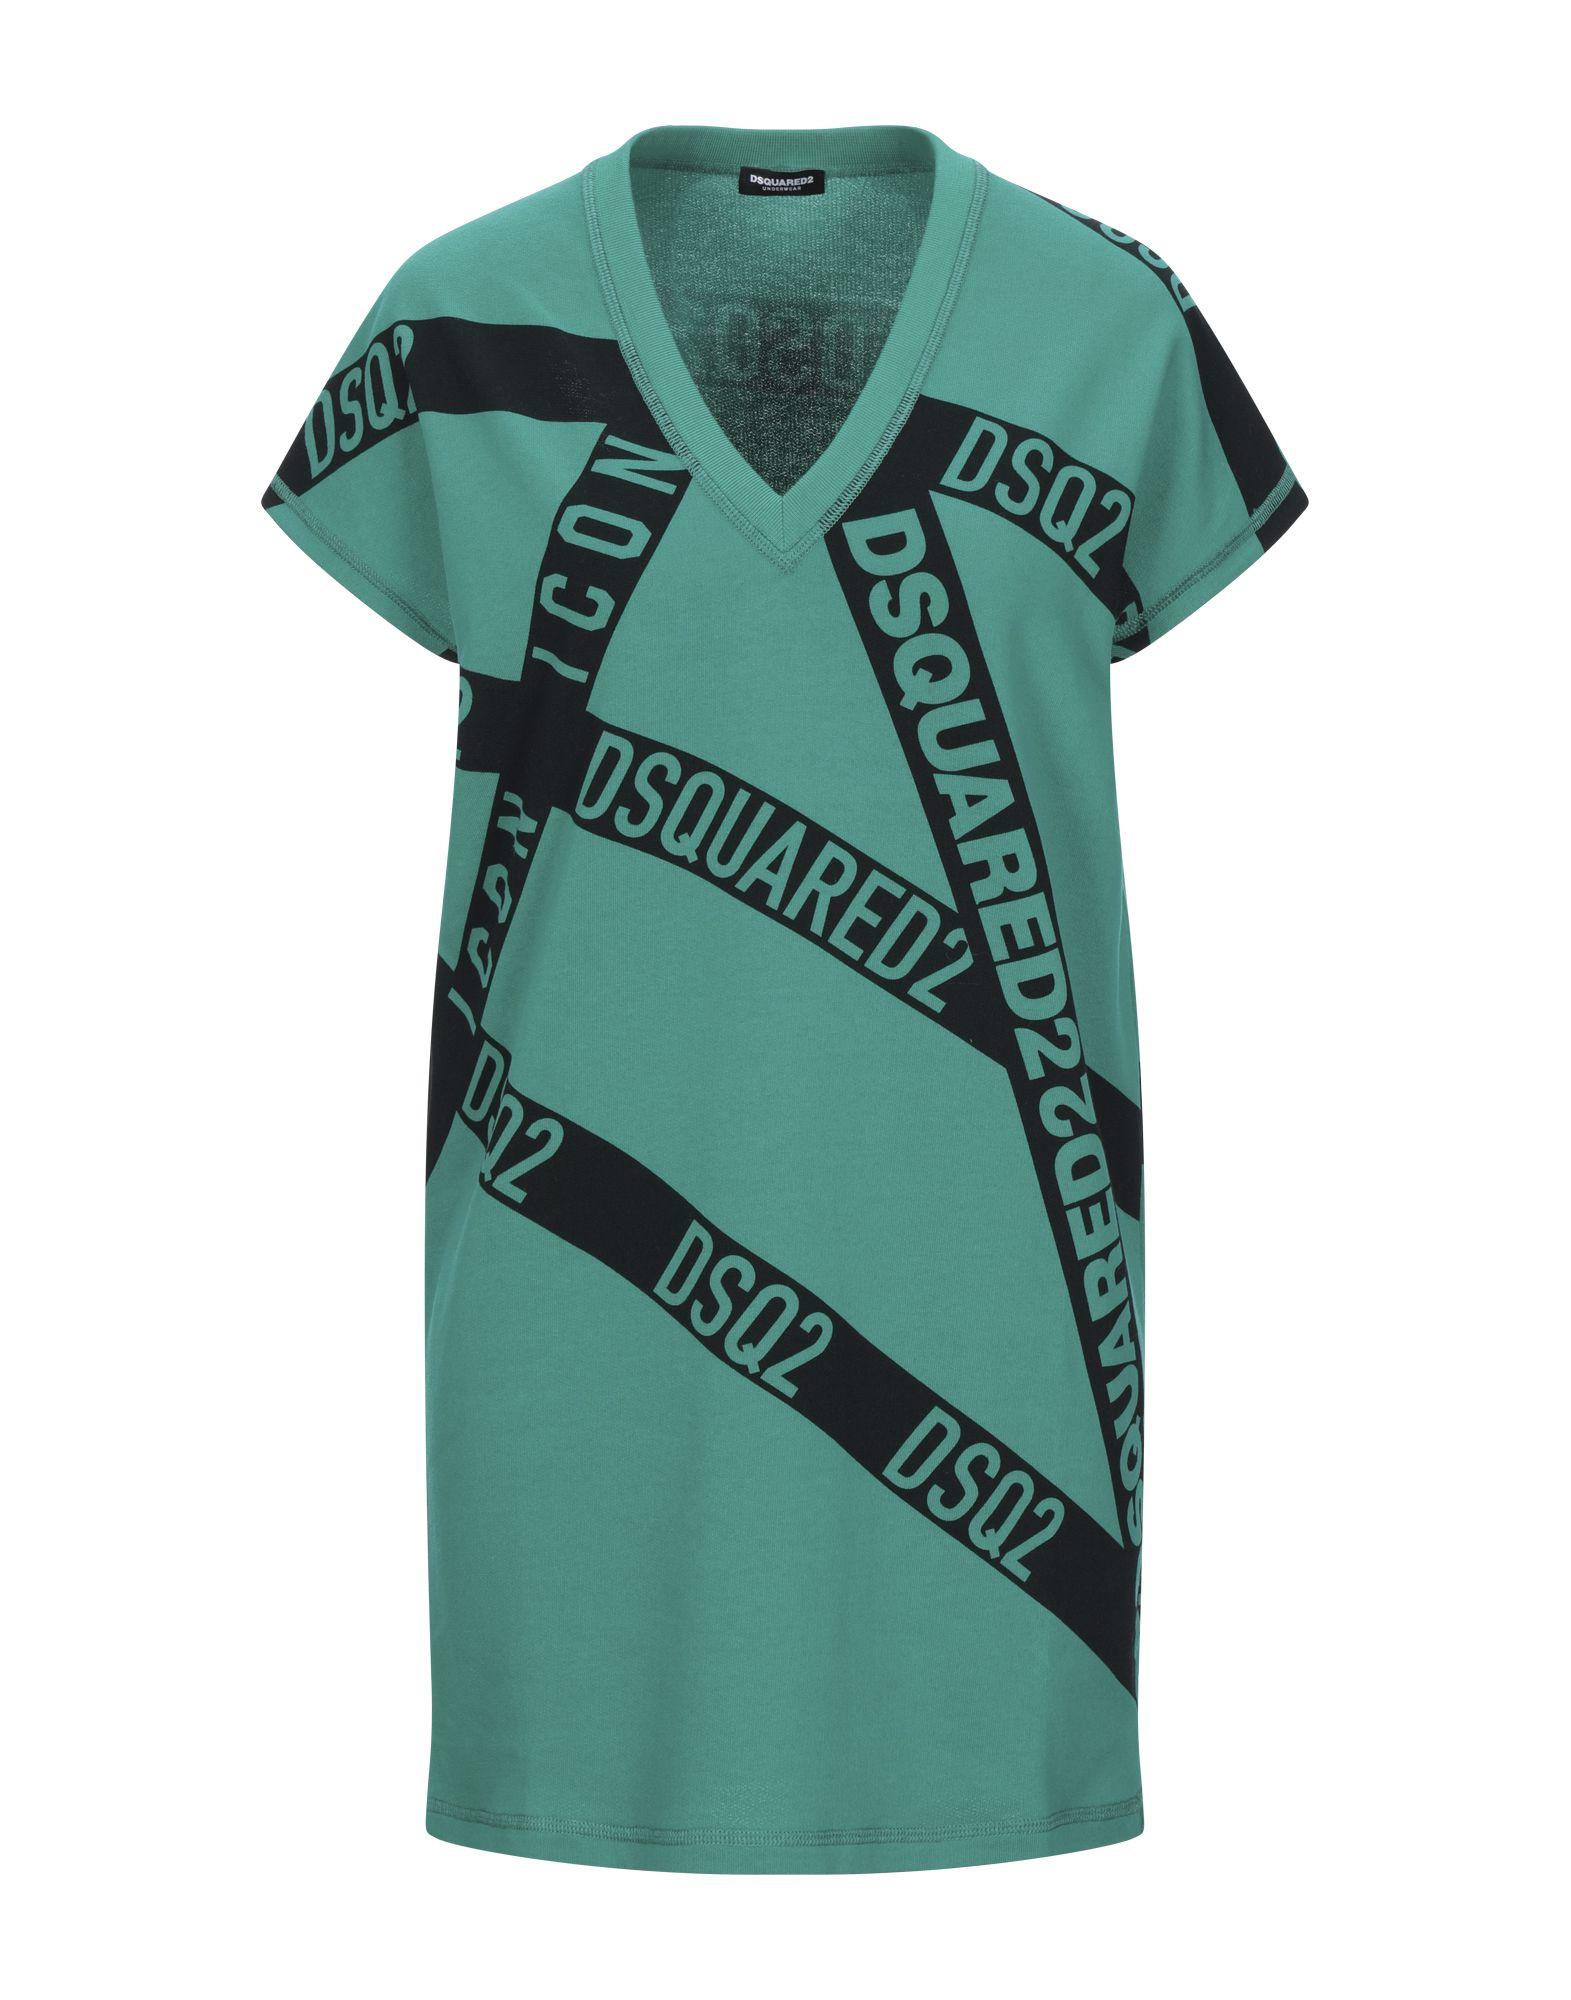 DSQUARED2 Nightgowns. sweatshirt fleece, no appliqués, logo design, short sleeves, v-neck, no pockets, french terry lining. 100% Cotton